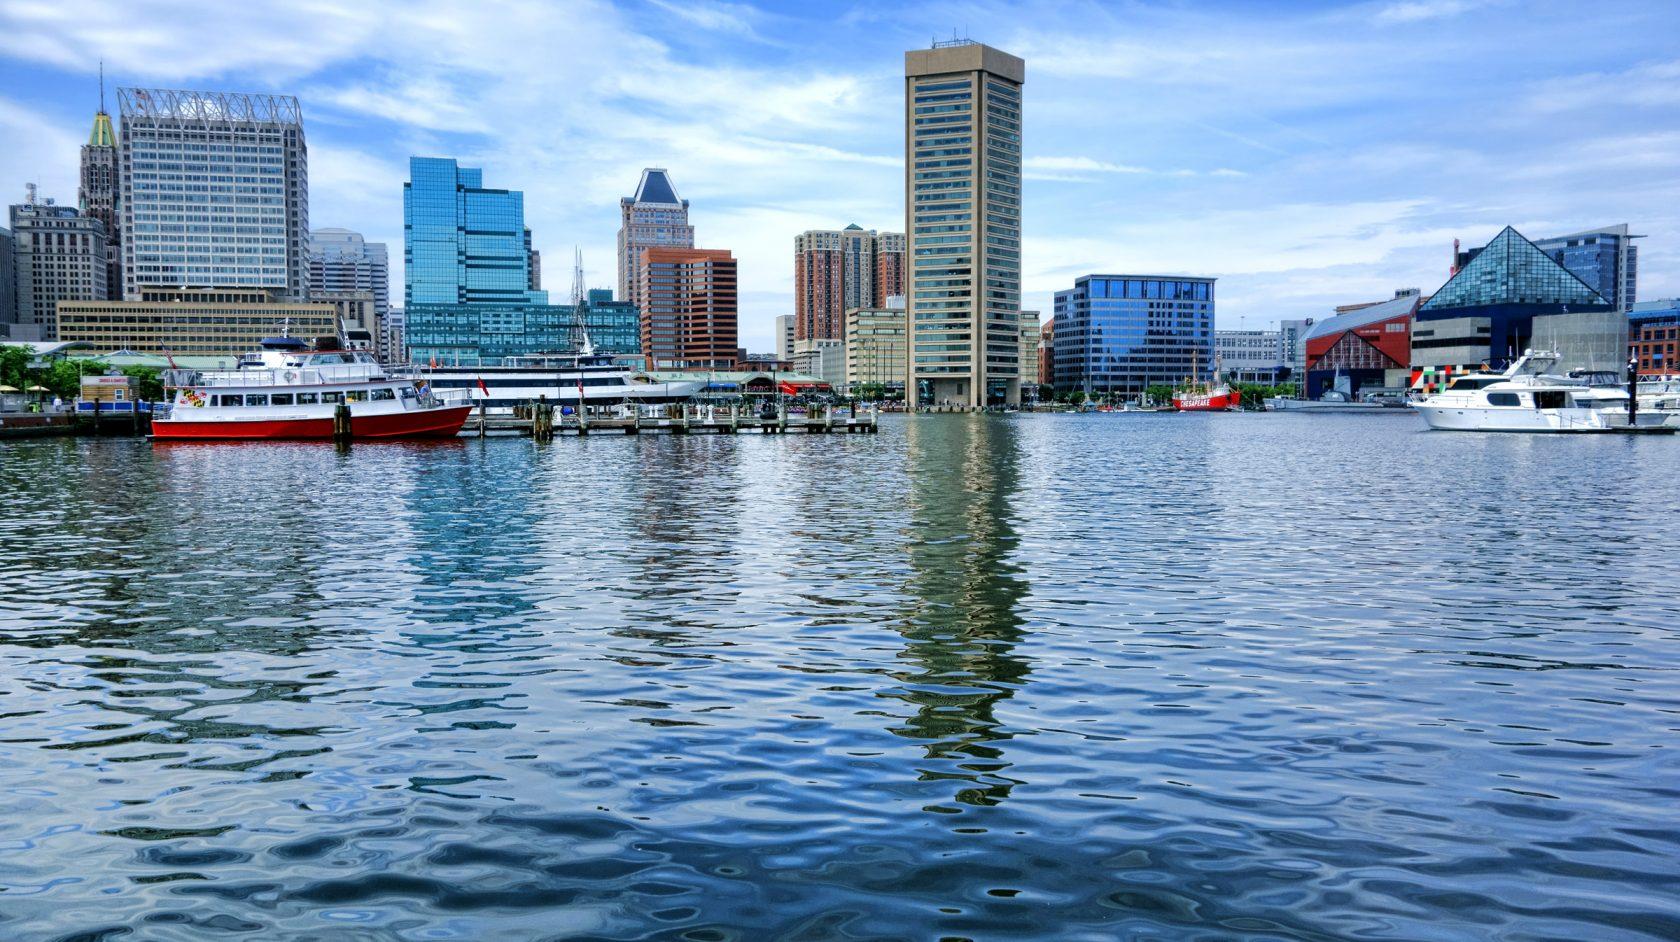 Baltimore Water Taxi Hotel RL Baltimore Inner Harbor